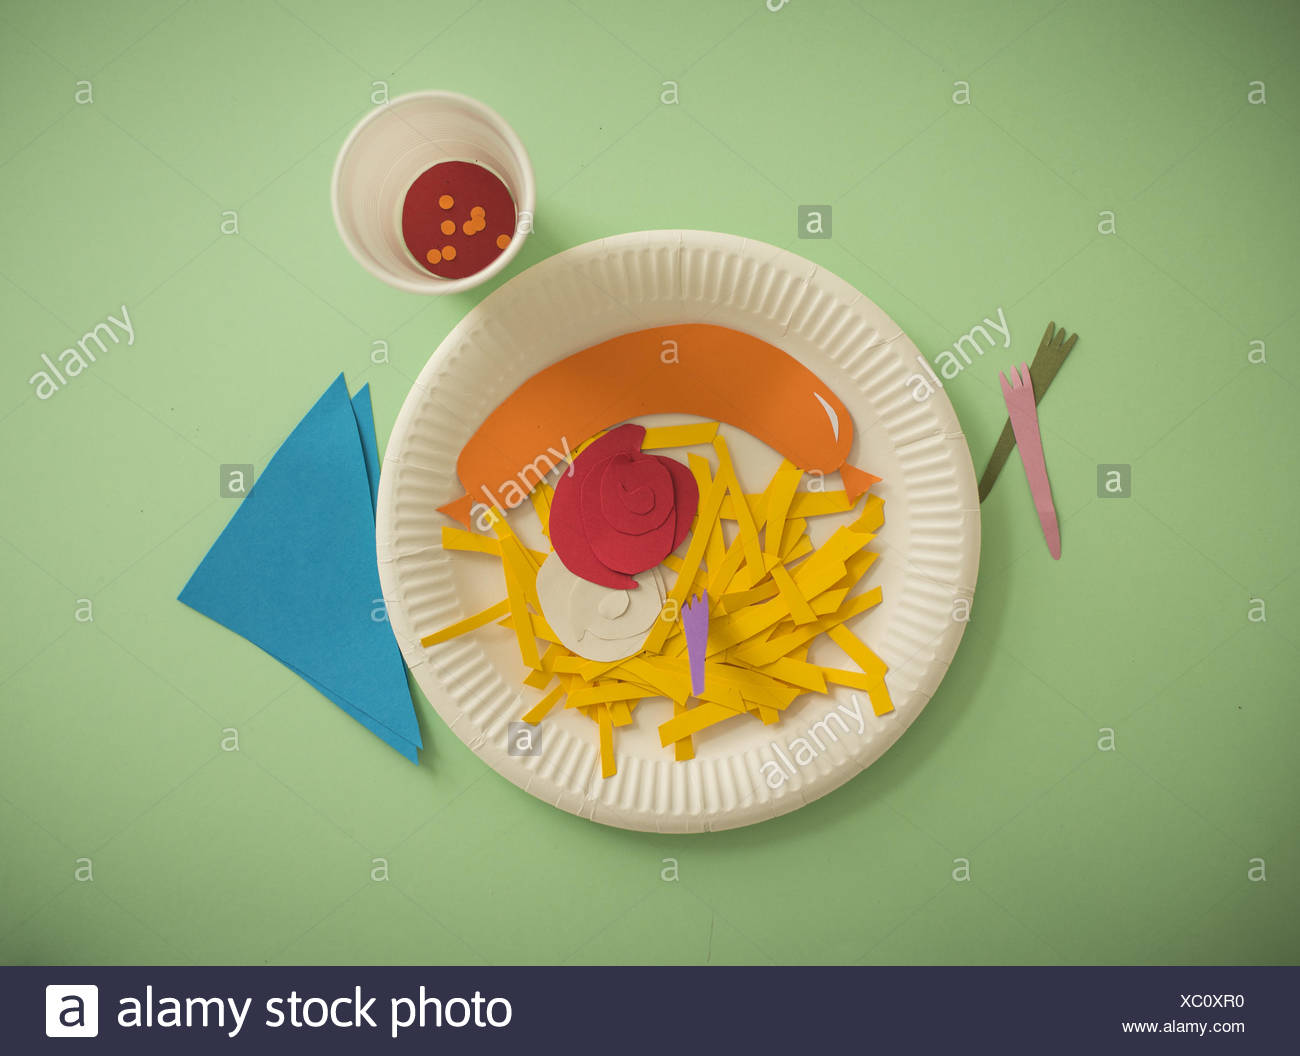 Junk Food - Stock Image